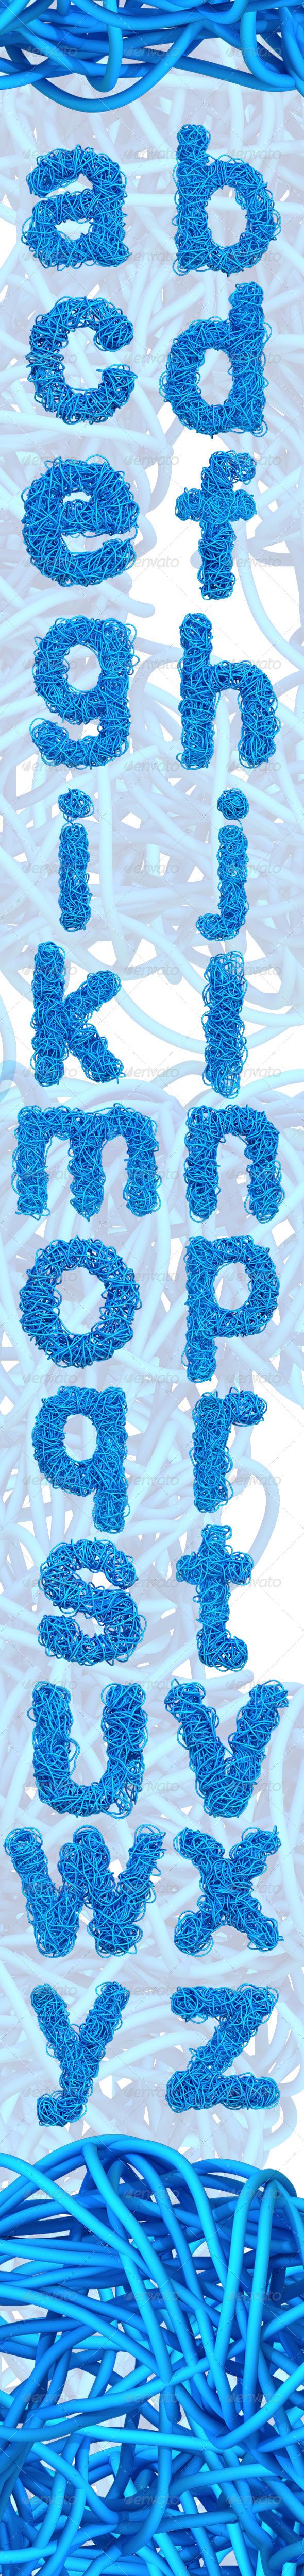 GraphicRiver Blue Cable Alphabet Lowercase 7228366